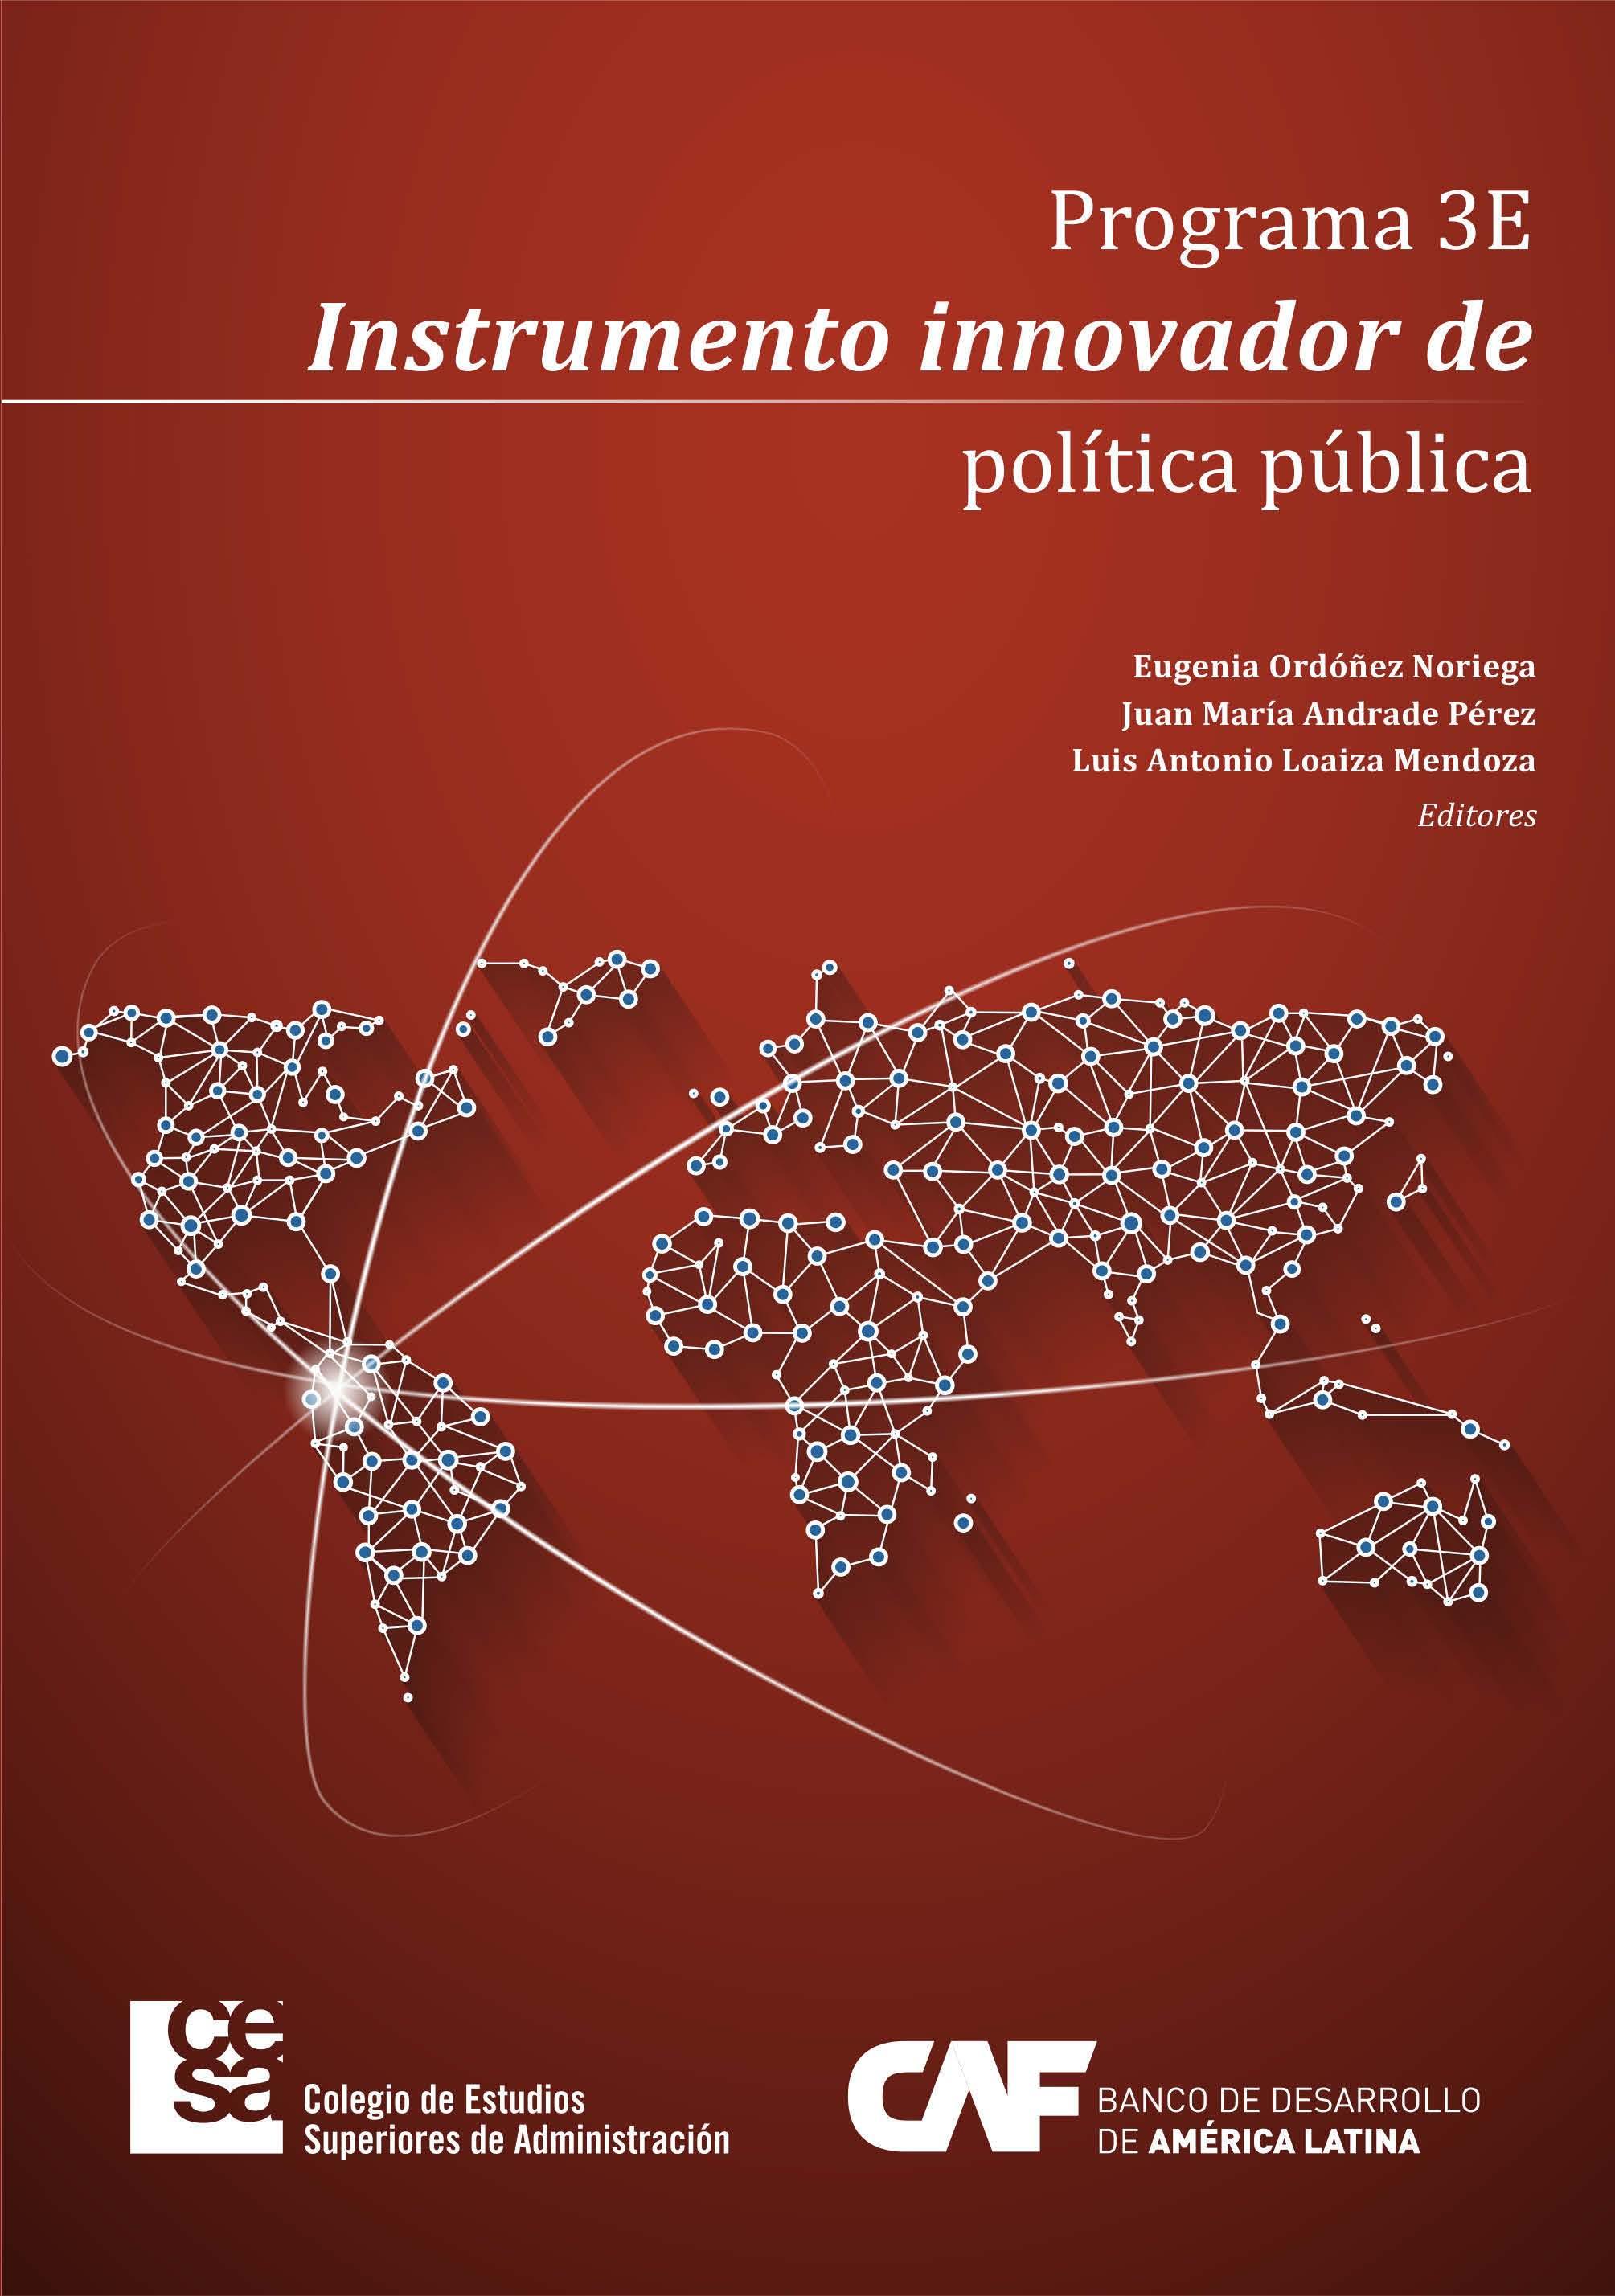 Instrumento innovador de política pública